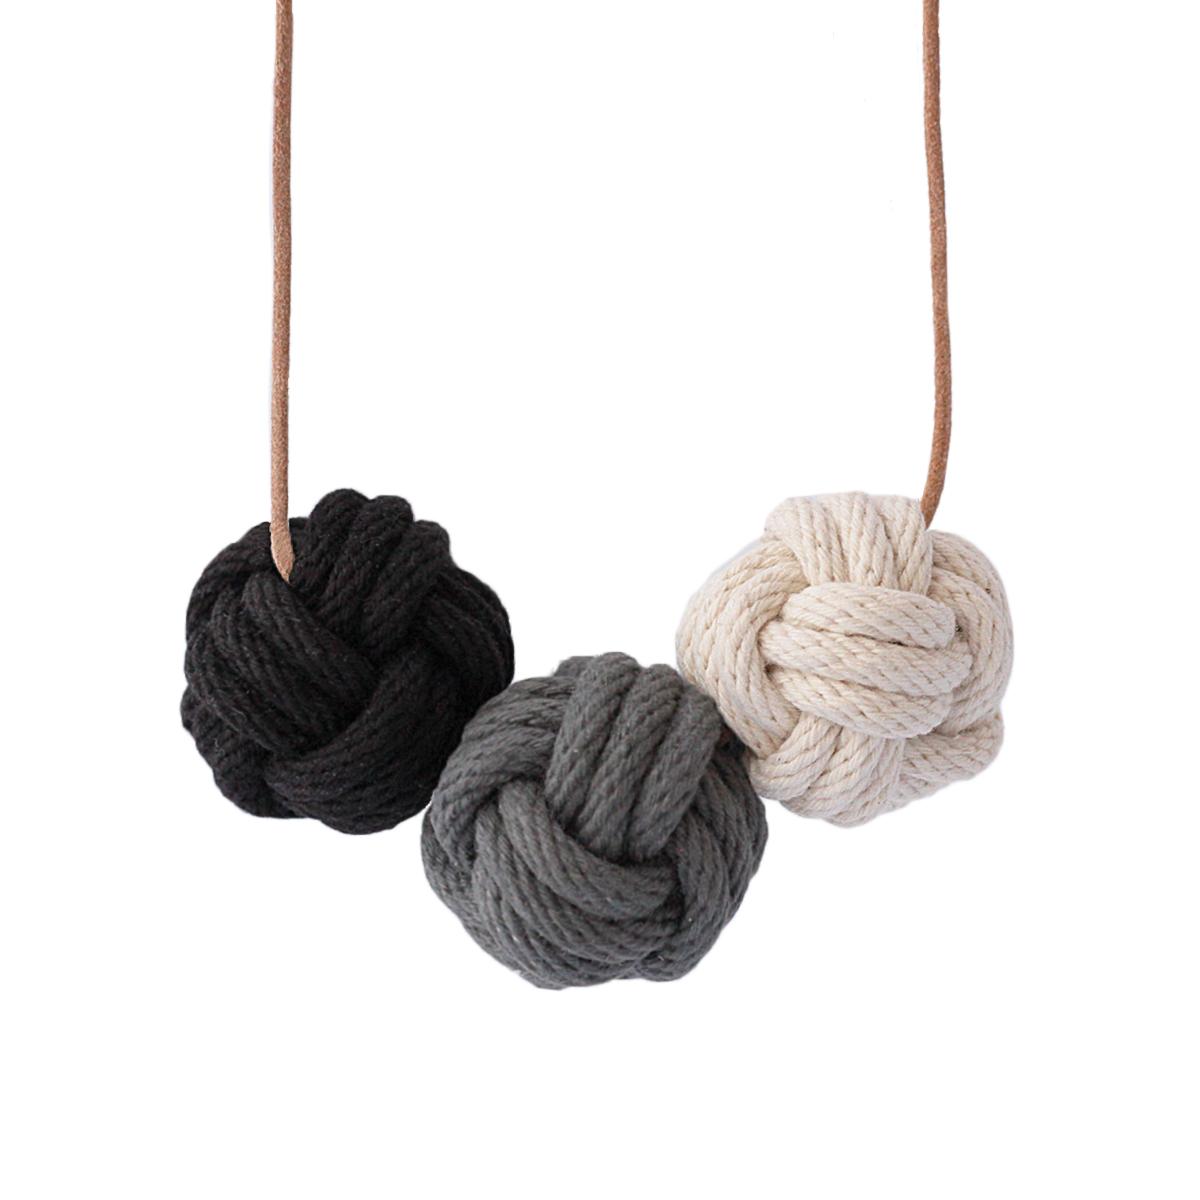 Nautical knot necklace melbourne